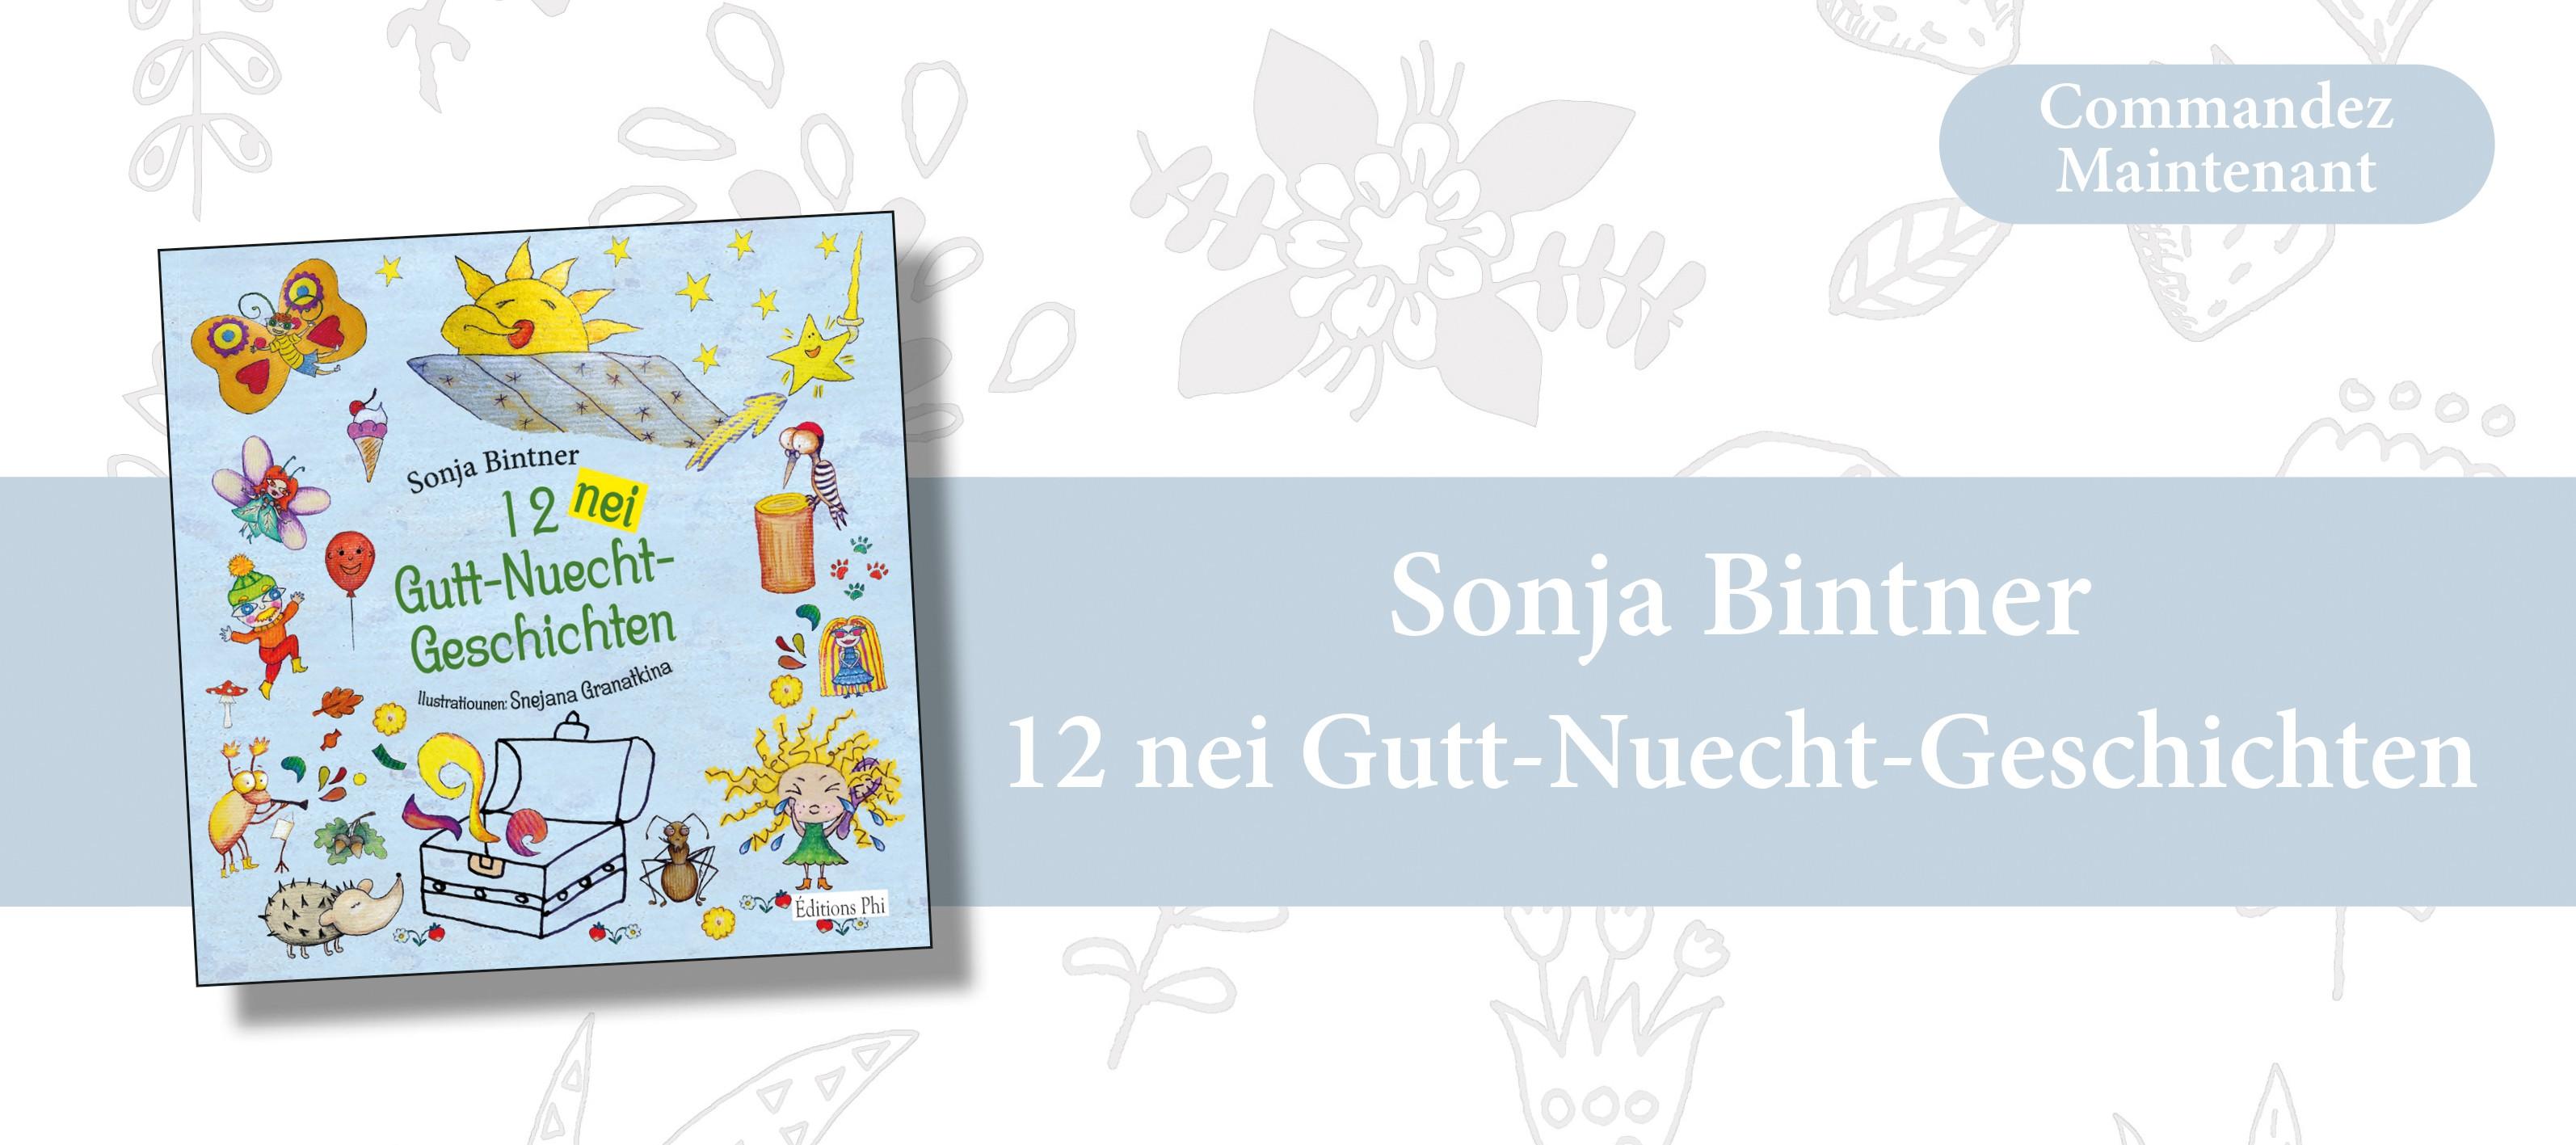 http://www.editionsphi.lu/fr/jeunesse/501-sonja-bintner-12-nei-gutt-nuecht-geschichten.html